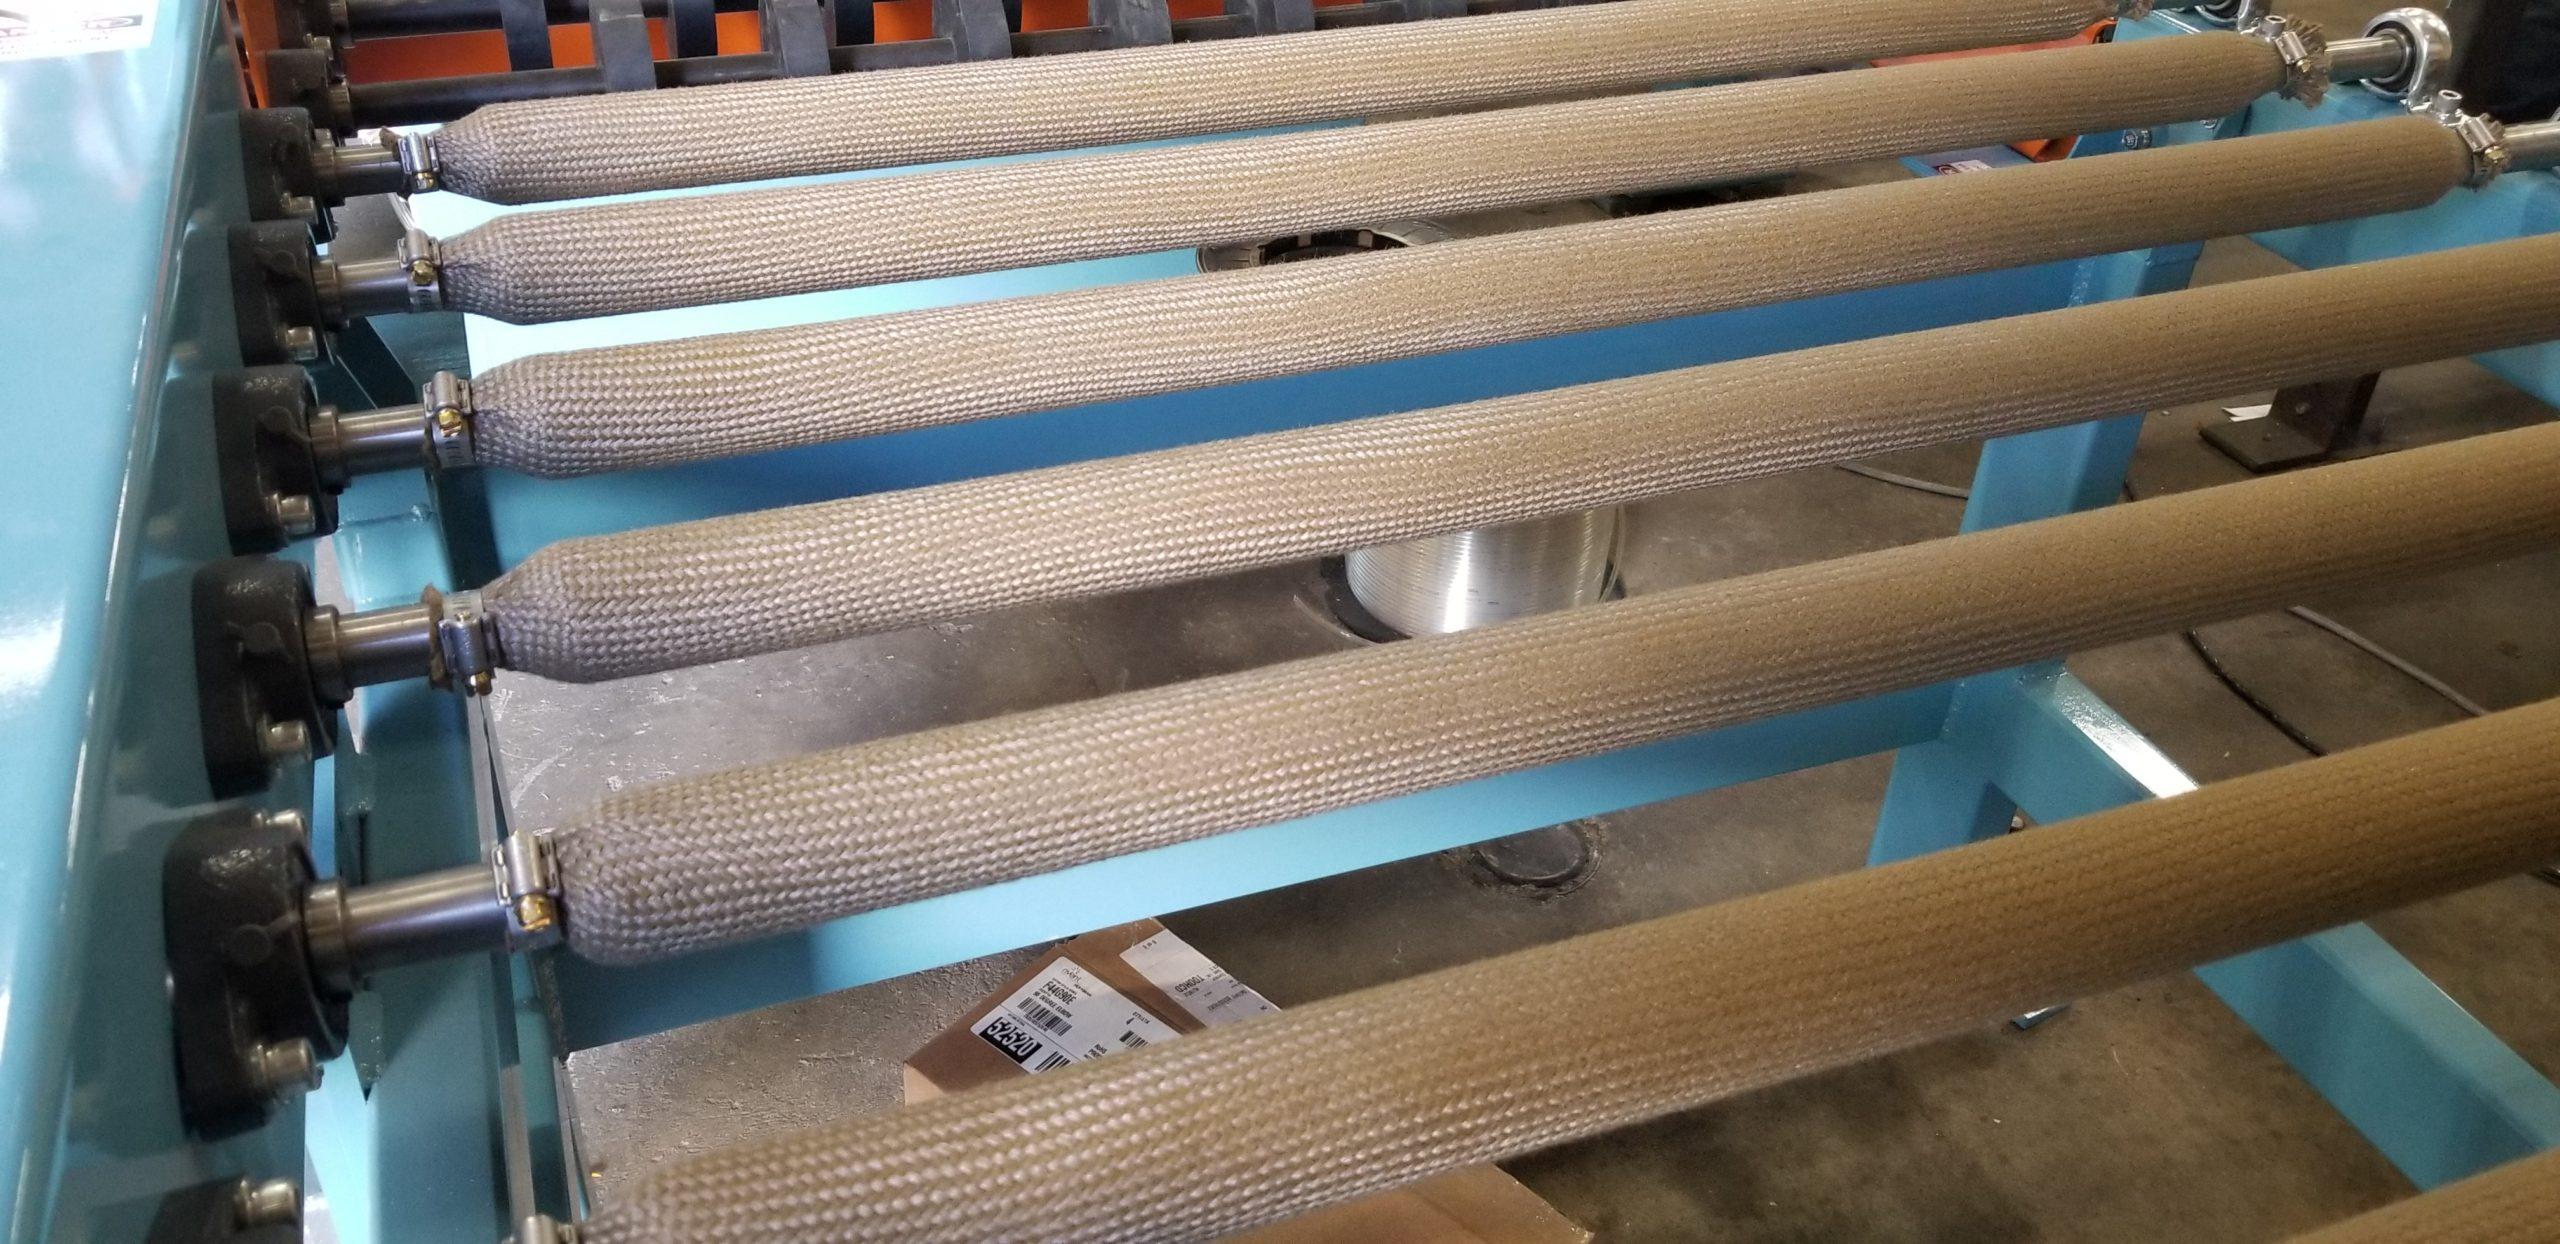 Roll Conveyors - High Temperature | Glassline